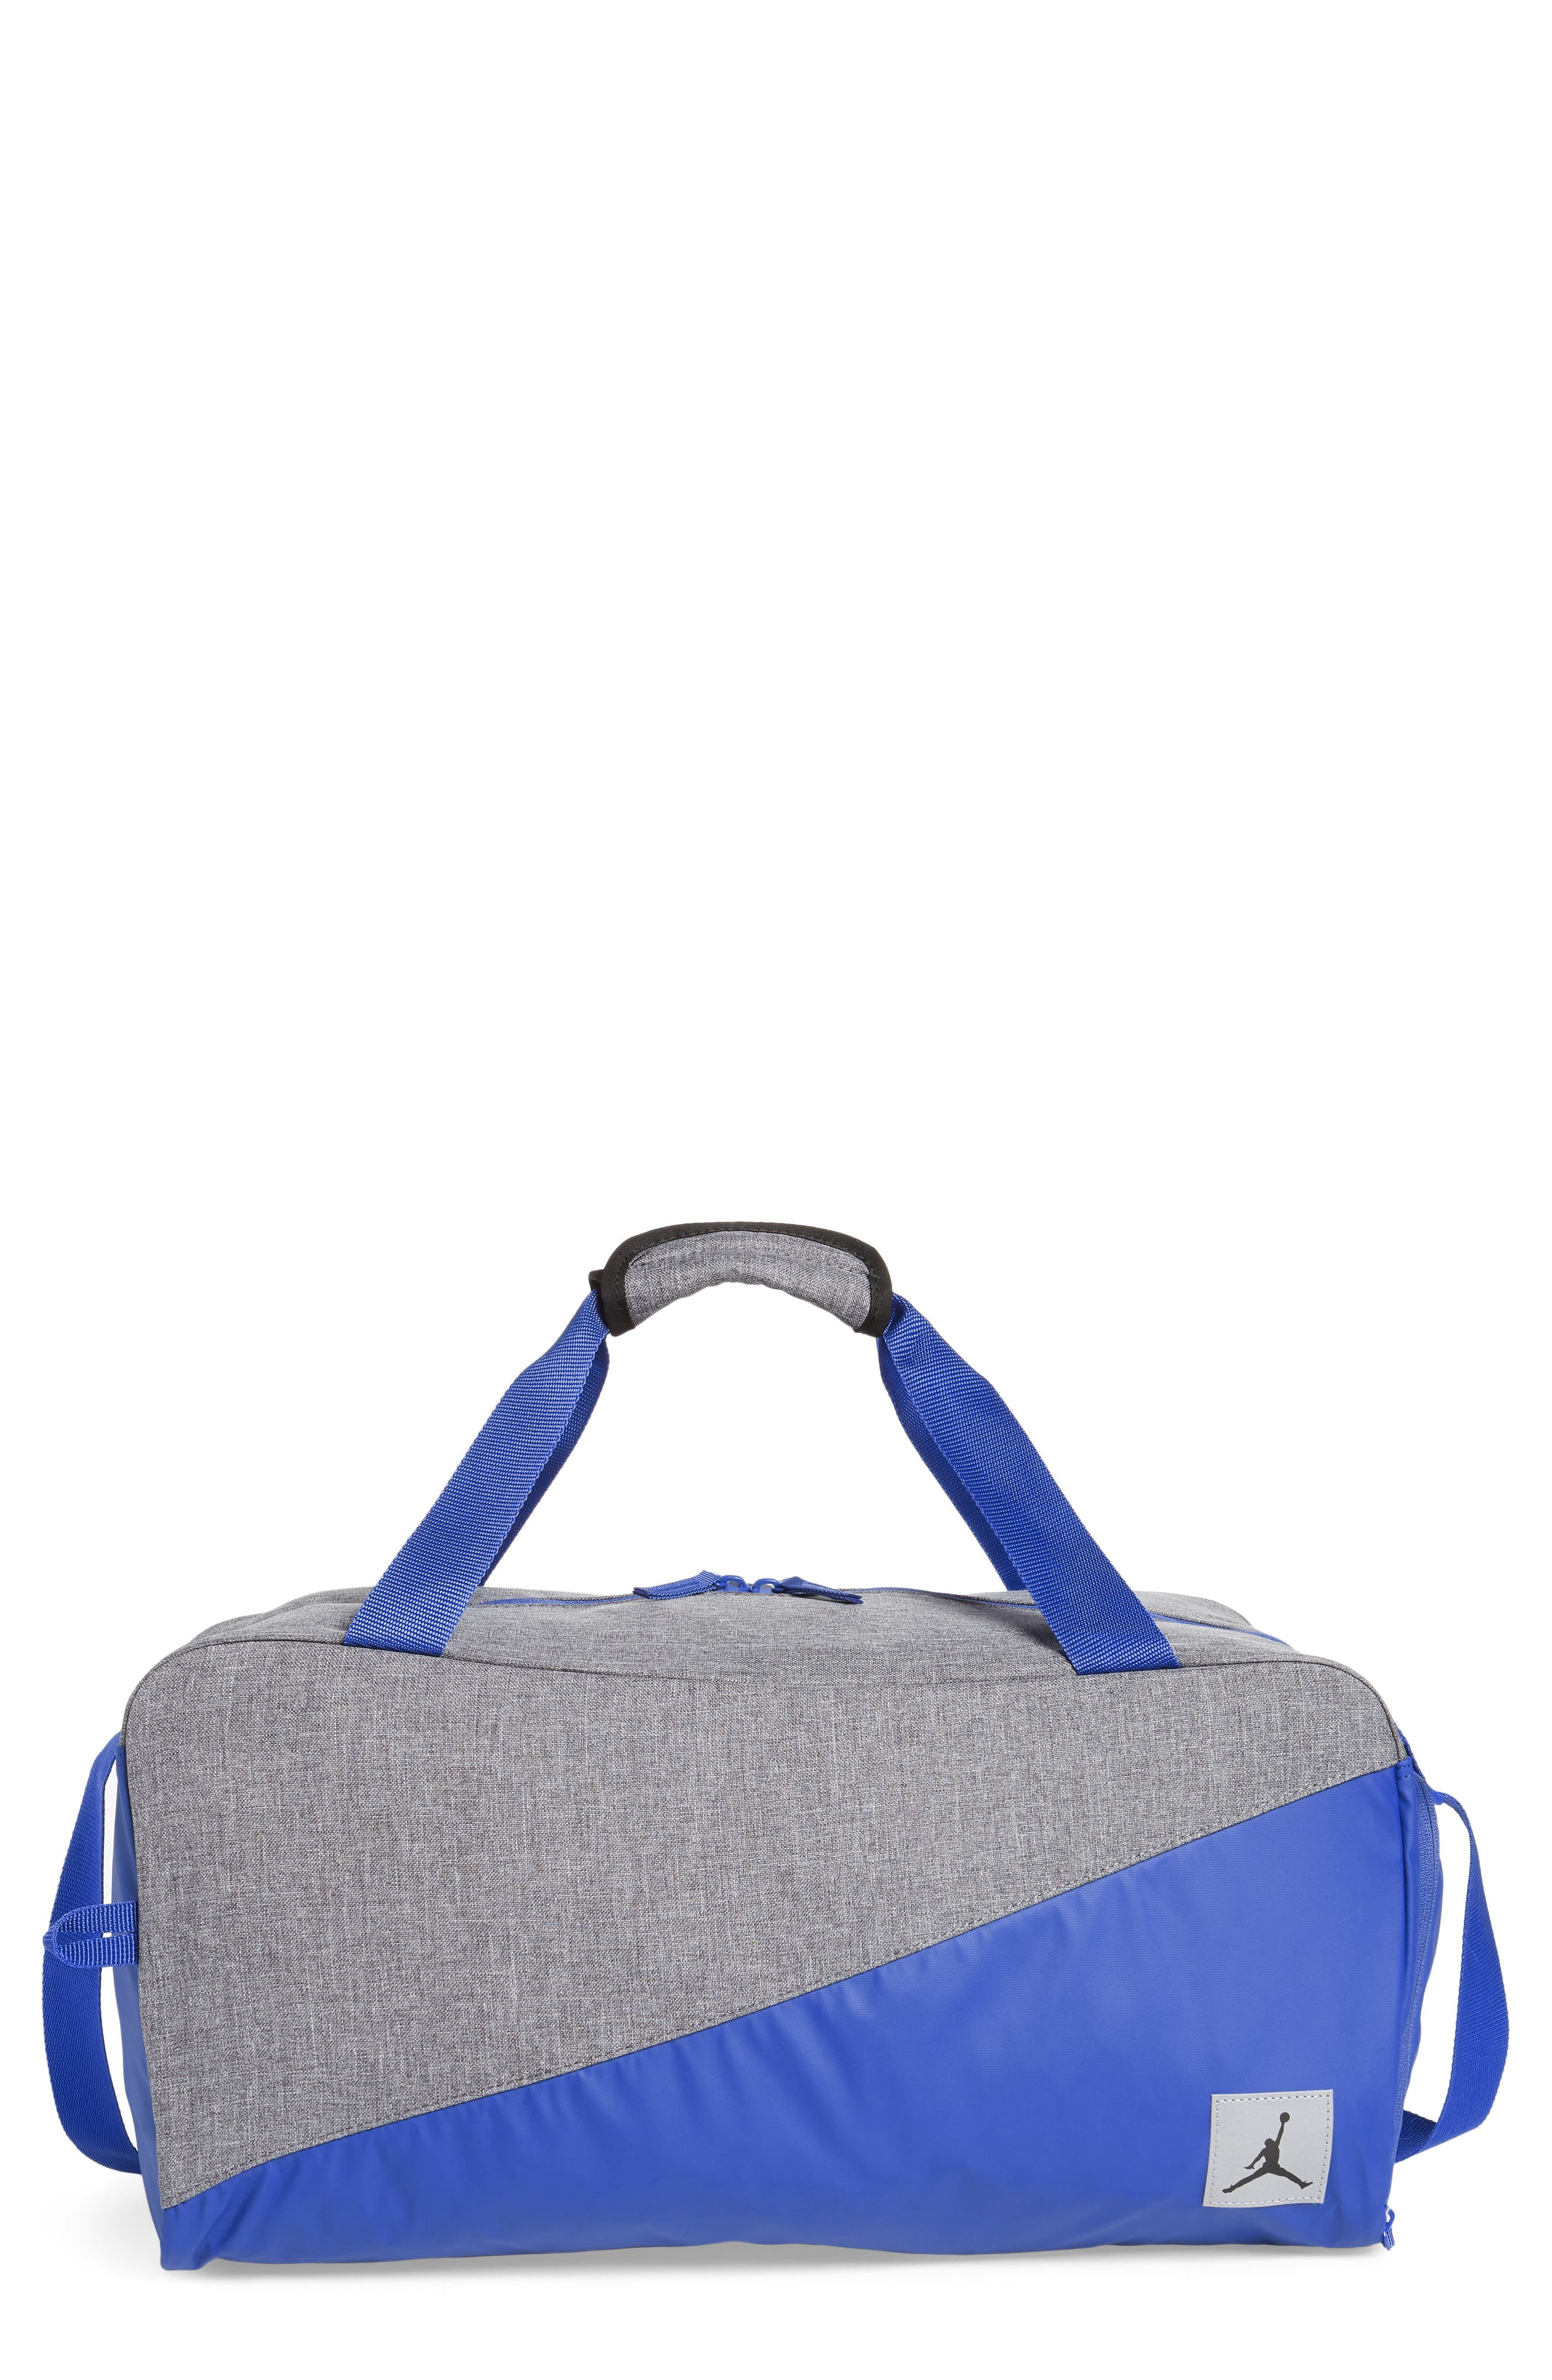 Jordan Pivot Duffle Bag,                             Main thumbnail 1, color,                             431